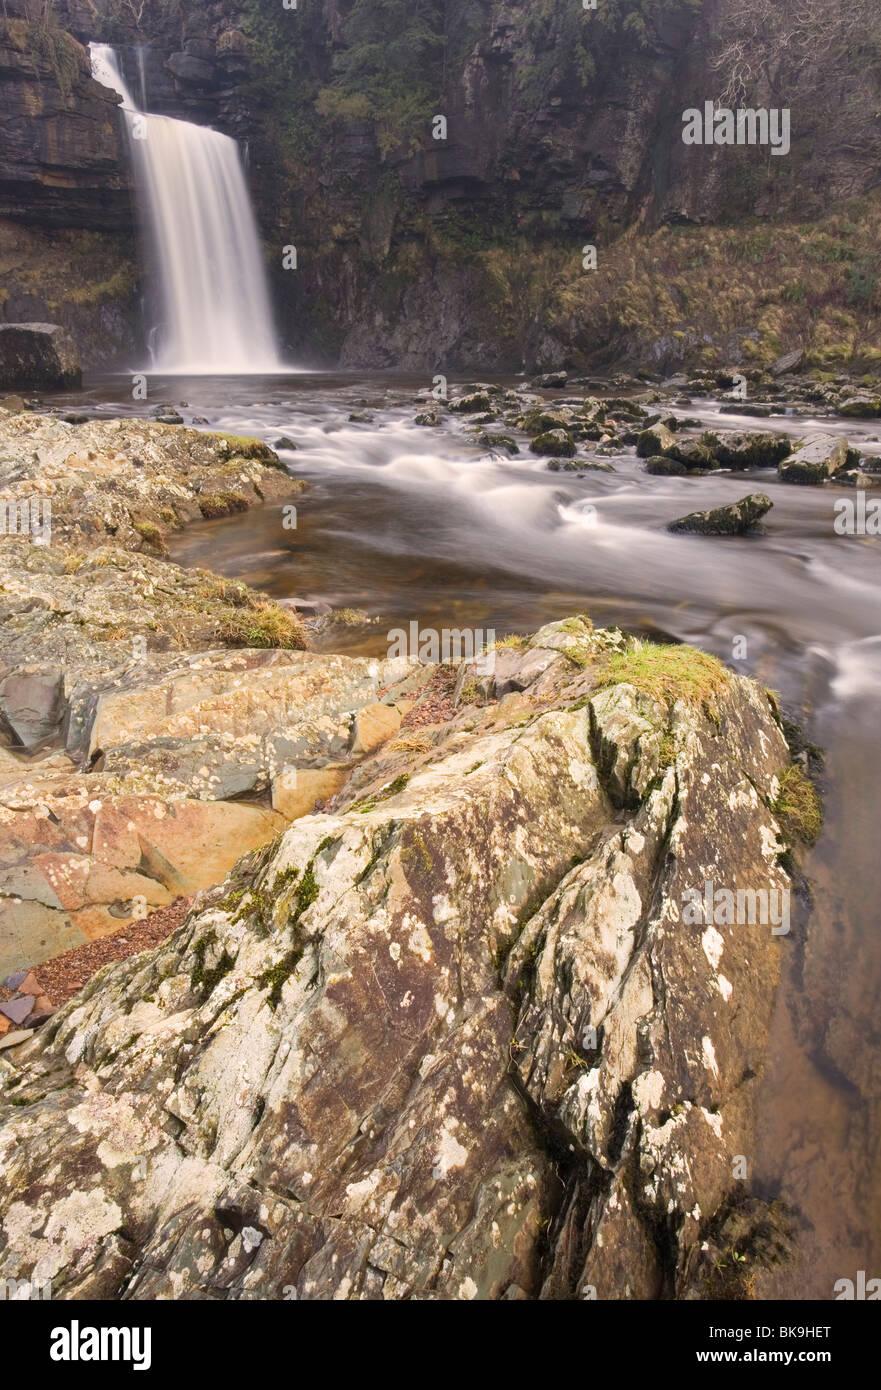 Thornton Force Waterfall, part of 'The Ingleton Waterfalls Walk' at Ingleton, Ribblesdale, Yorkshire Dales, - Stock Image